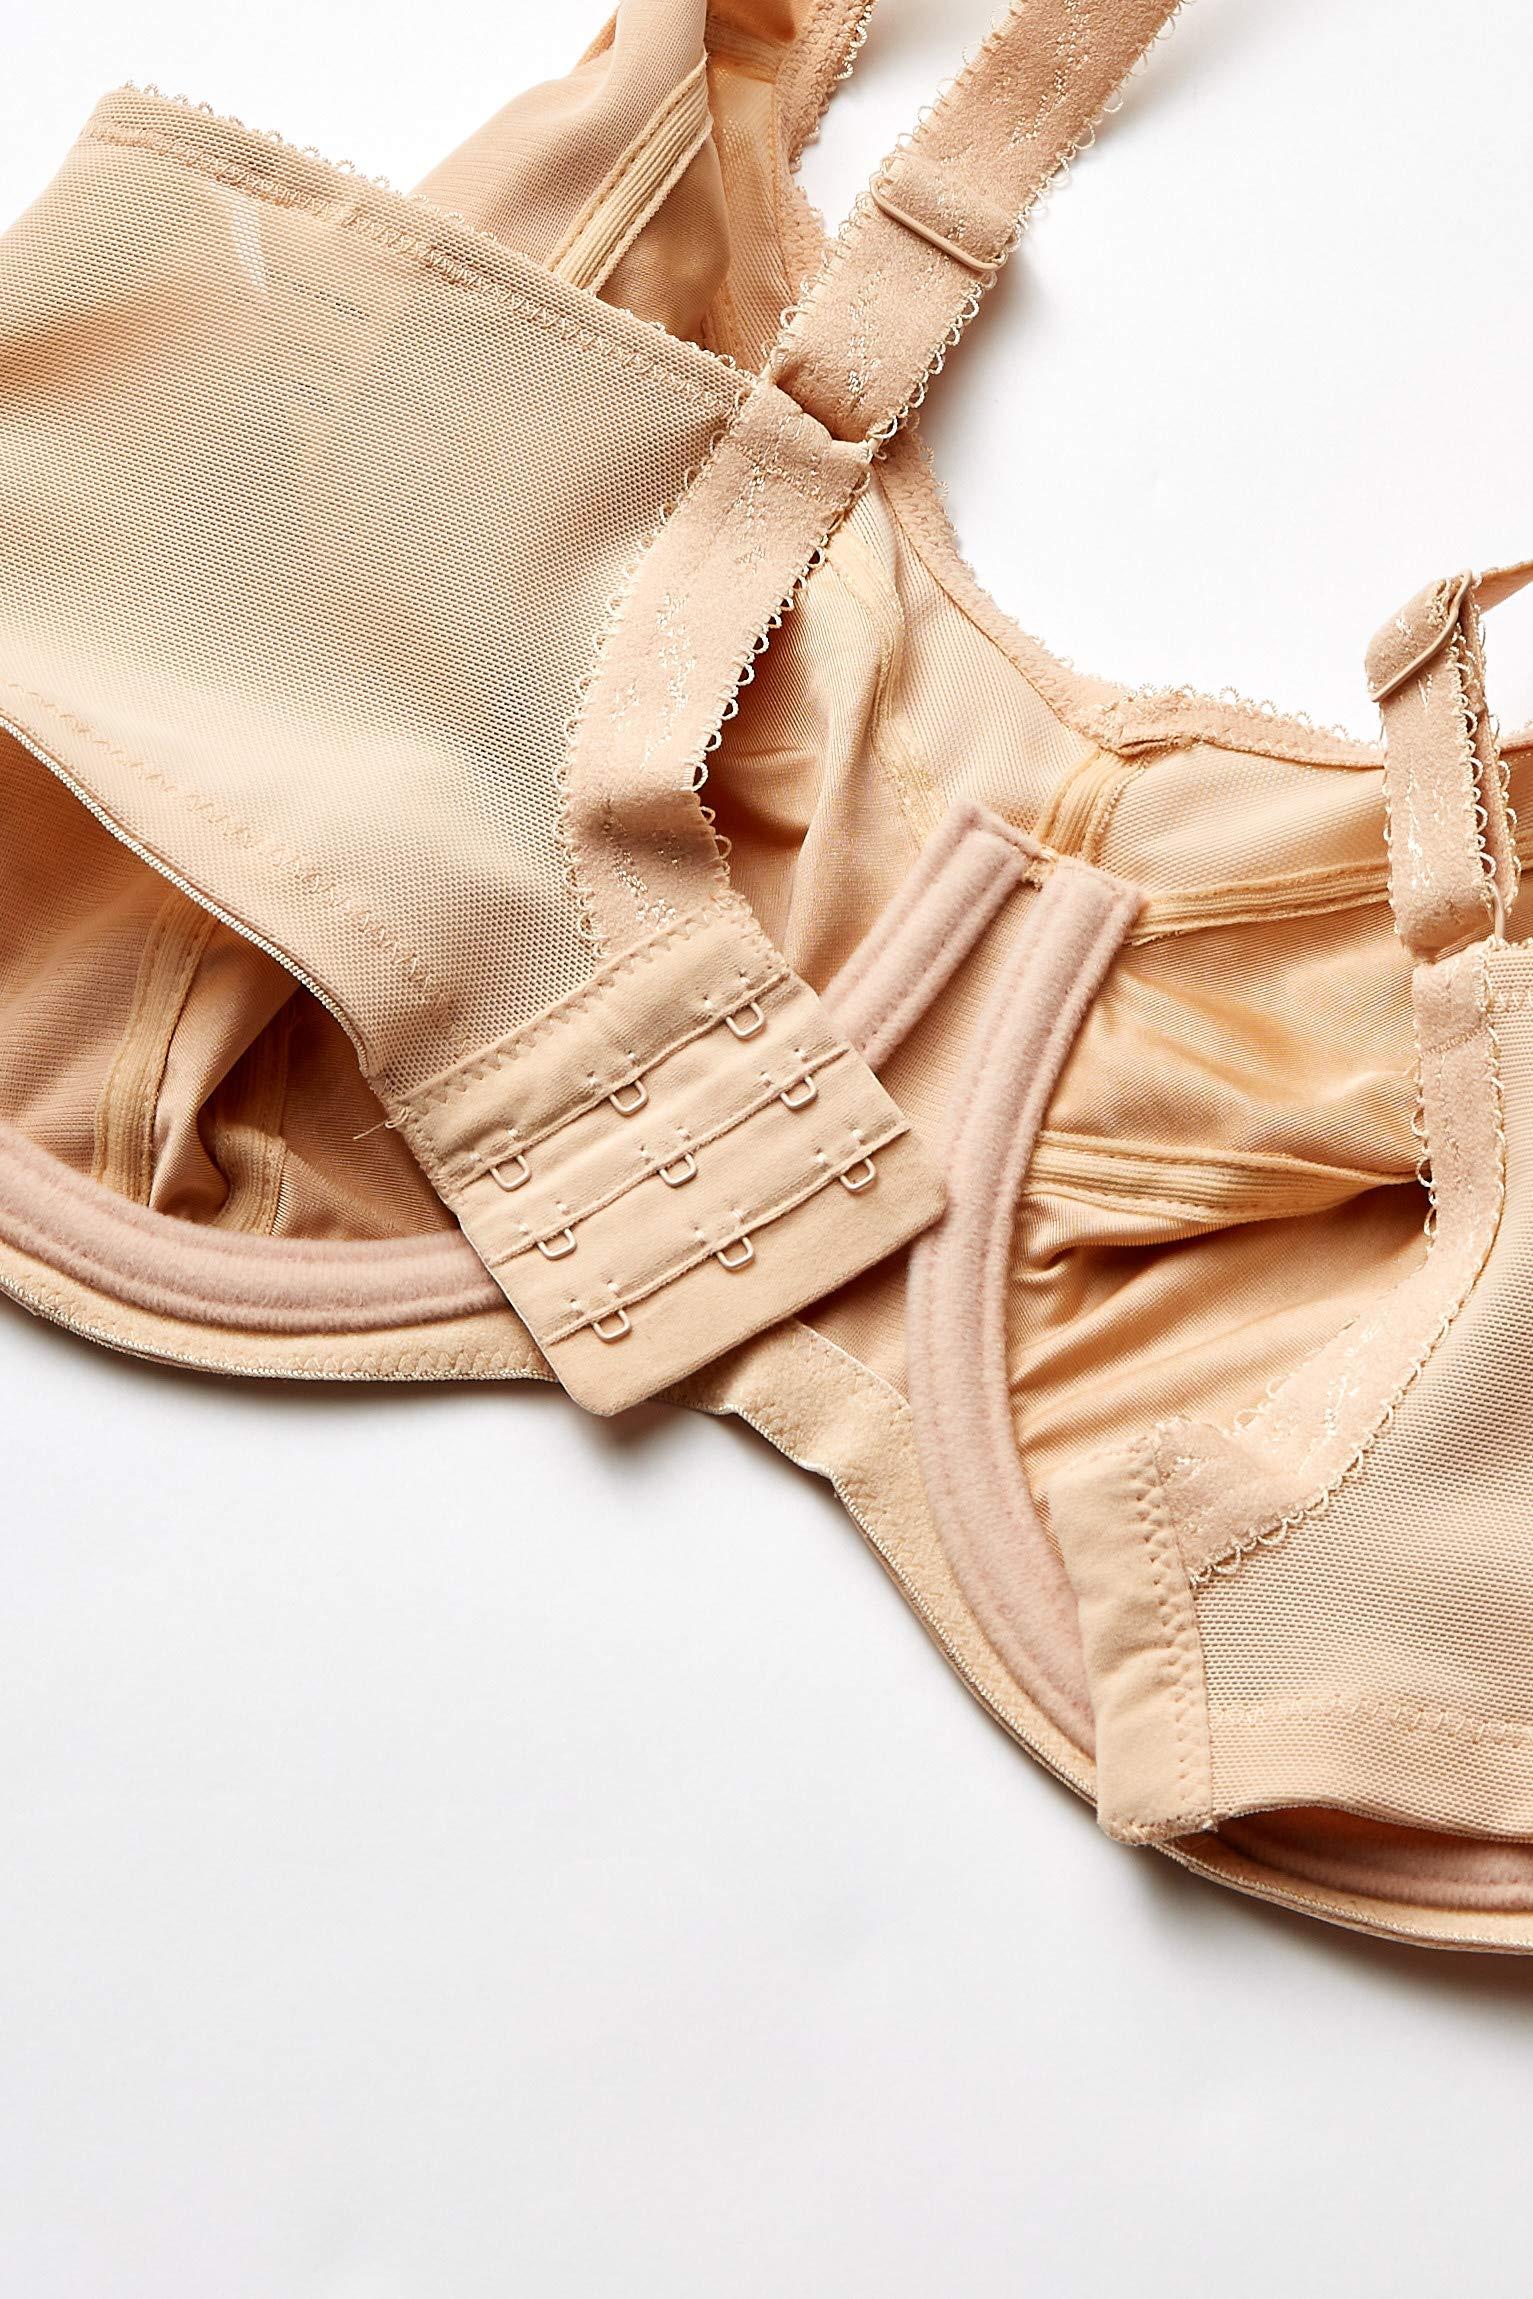 Goddess Women/'s Plus-Size Petra Full Cup Underwire Choose SZ//color